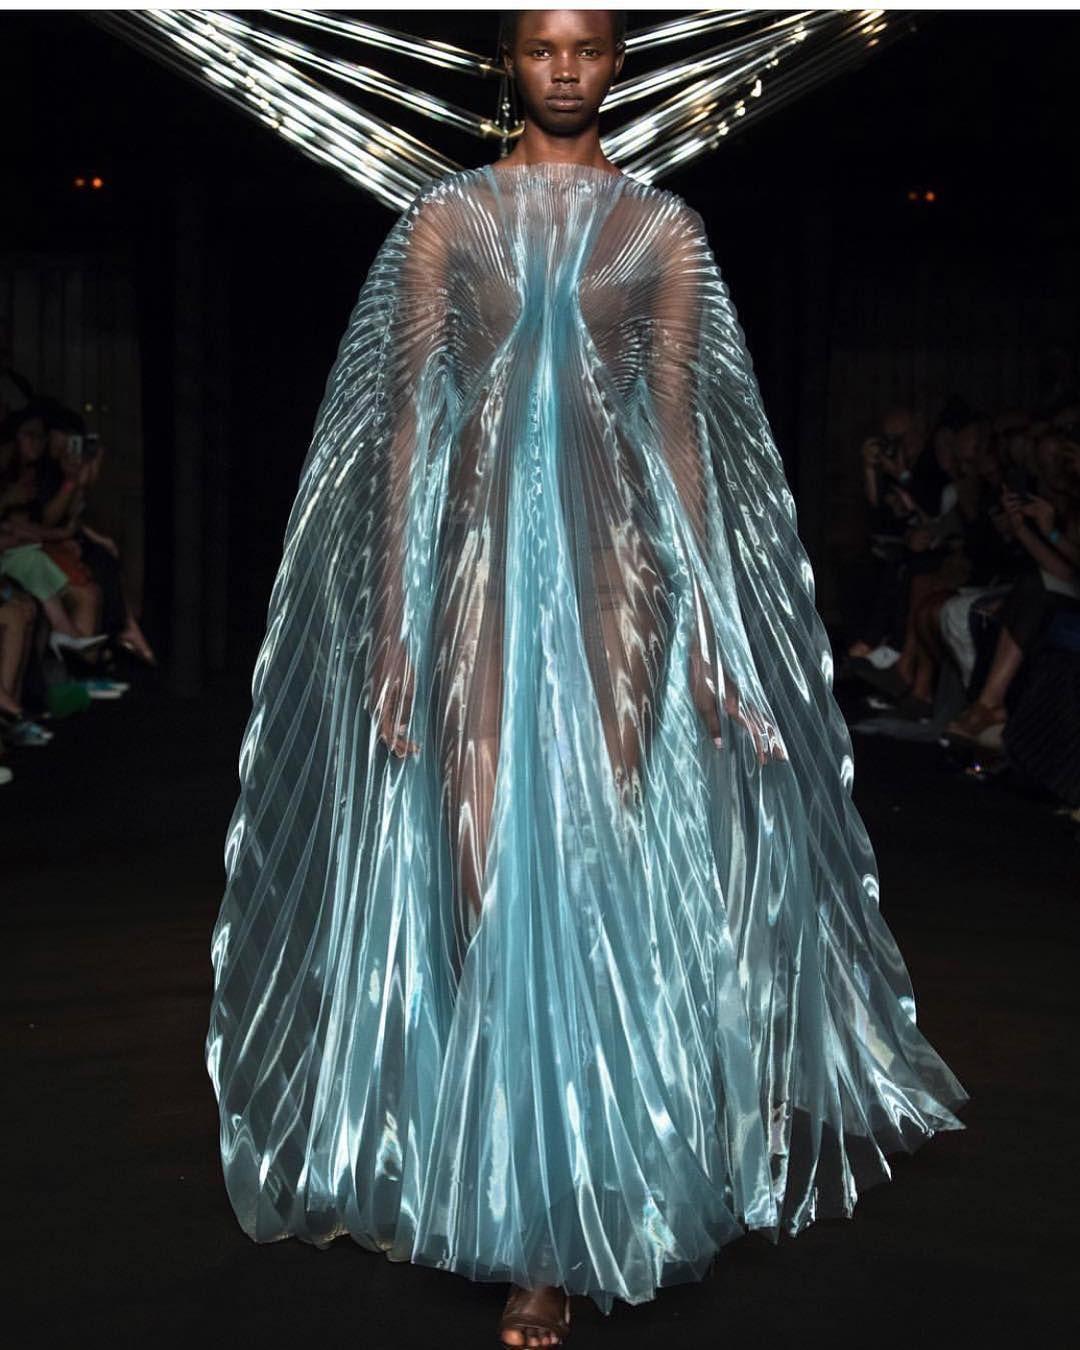 The Aeolian Dress By Irisvanherpen Parisfashionweek Photography Yannisvlamos Styling Patti Wilson Makeup Ter Iris Van Herpen Fashion Transparent Fashion